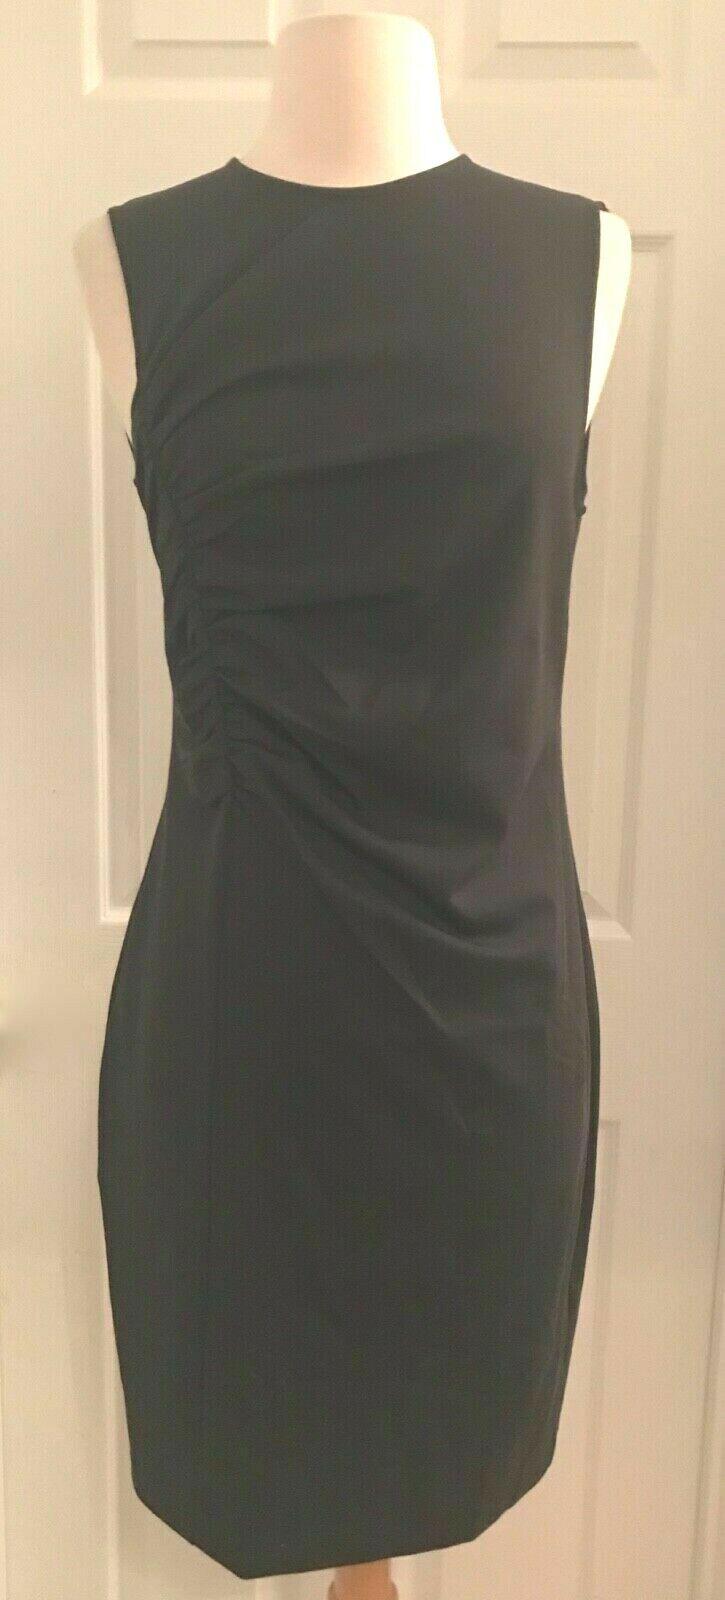 J.CREW RUCHED PONTE SHEATH DRESS DRESS DRESS Sz 6 HEATHER CHARCOAL K2197  128 00e355